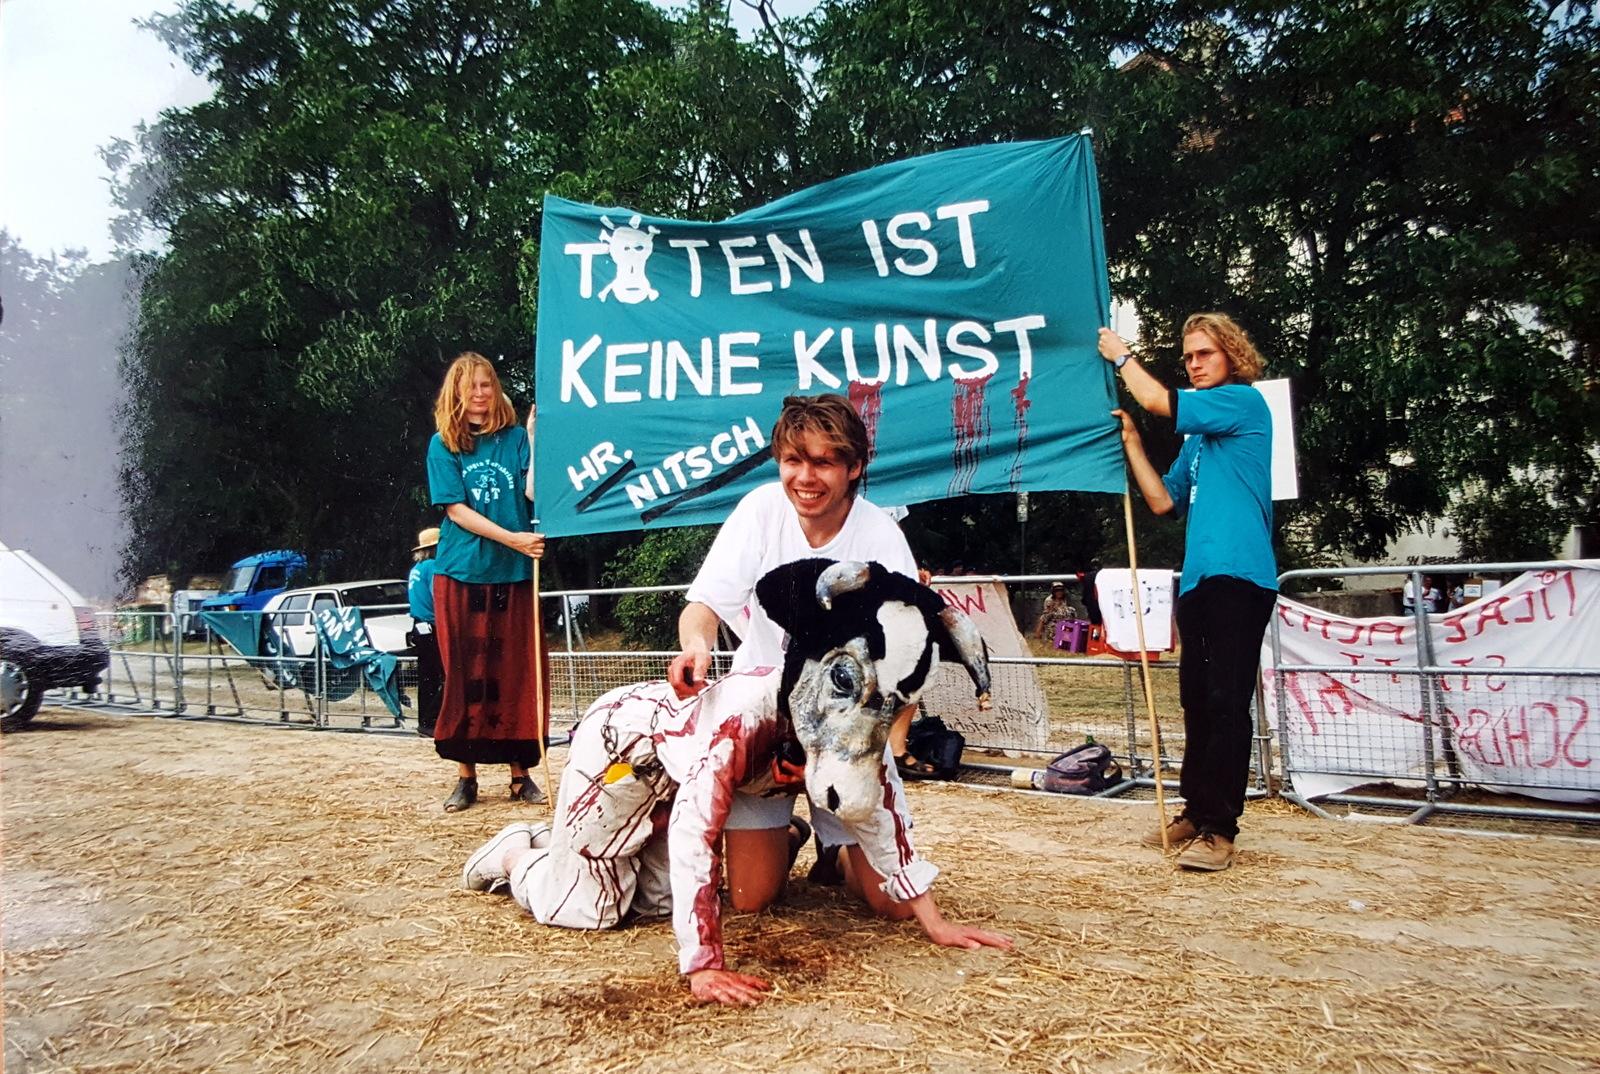 1998-08-03-08-nitsch-6-tage-orgien-mysterien-theater-1